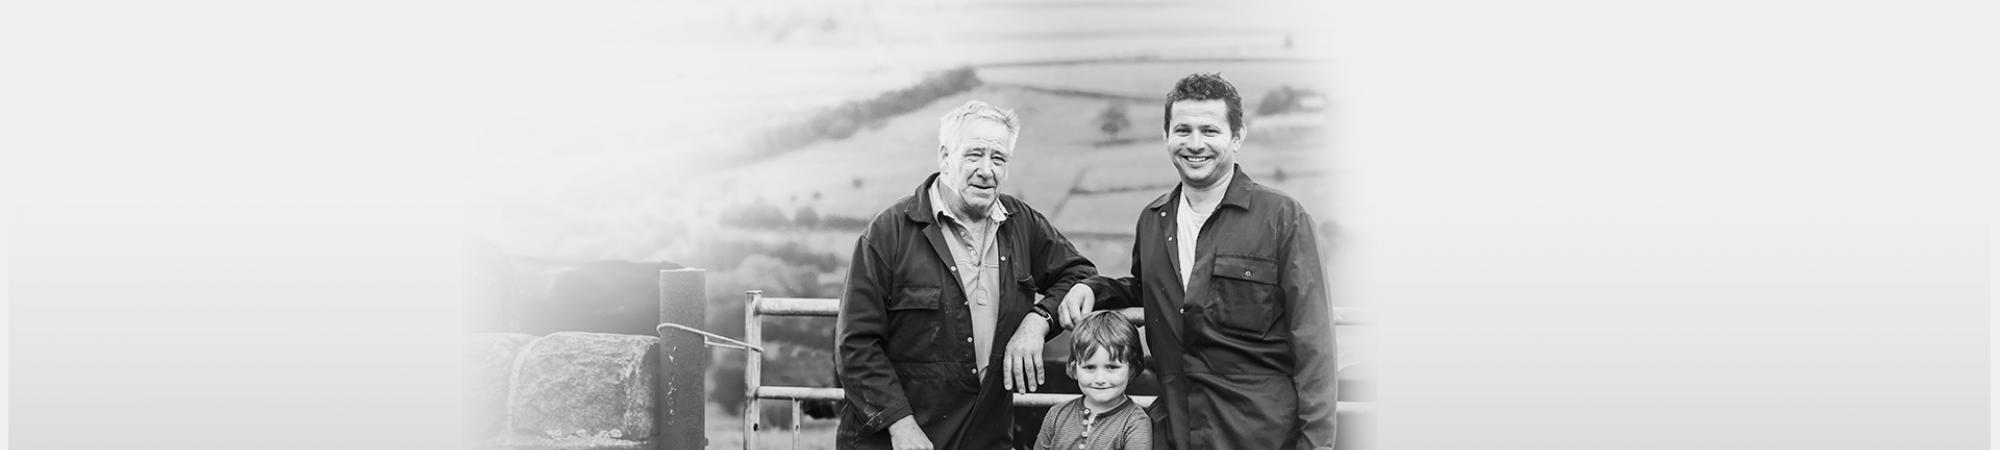 bandeau corporate techna famille agriculteurs